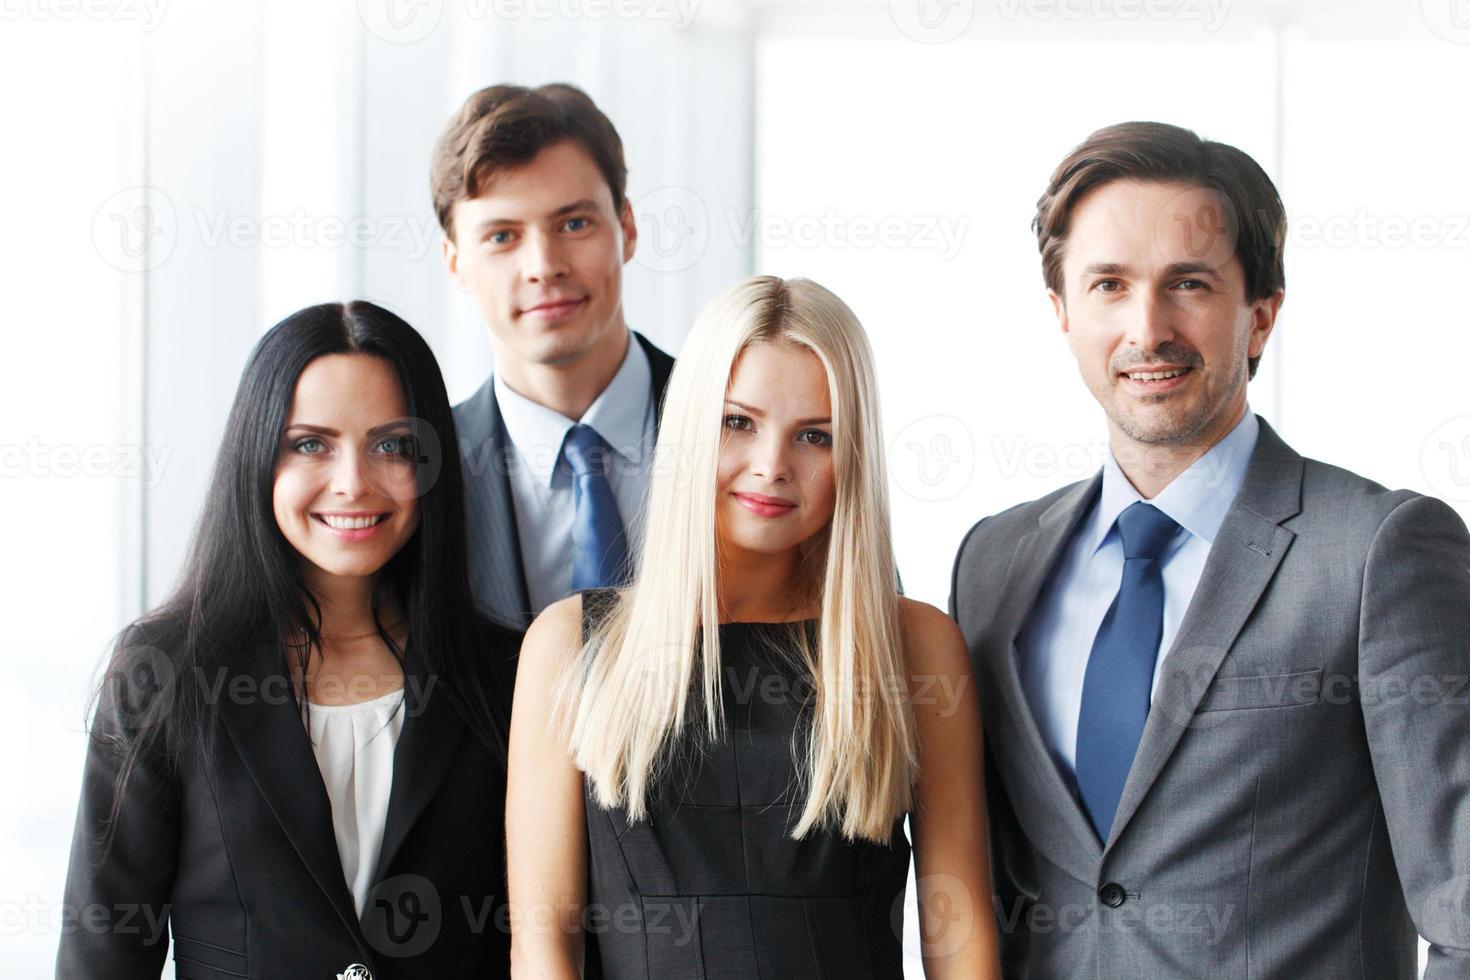 zakelijke team portret foto